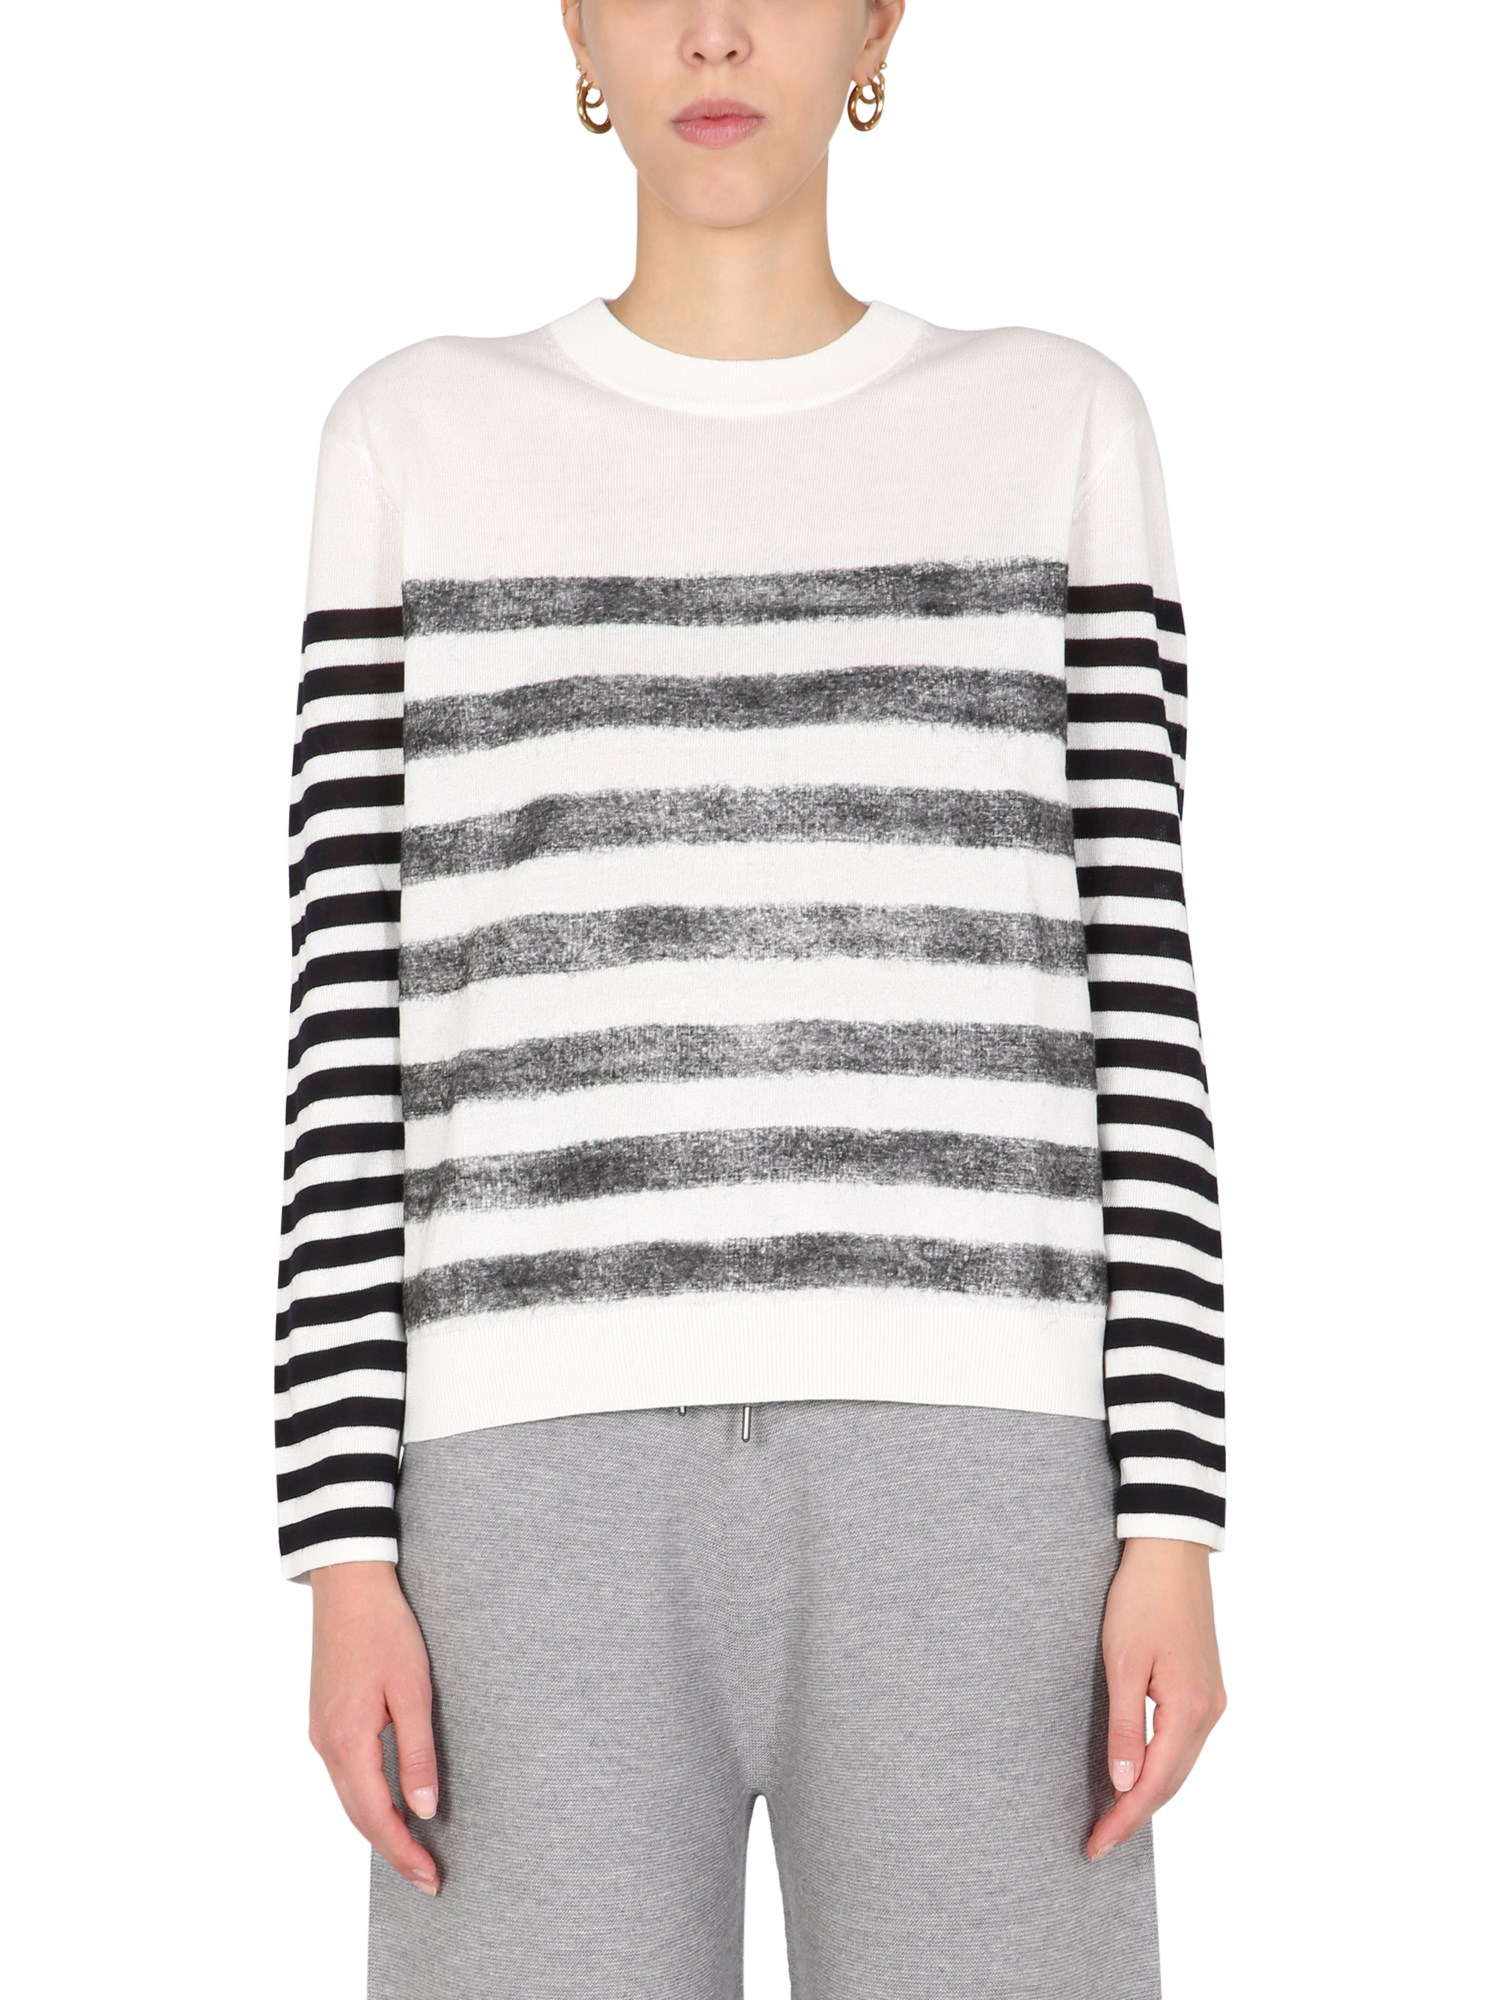 Ps by paul smith striped sweater - ps by paul smith - Modalova